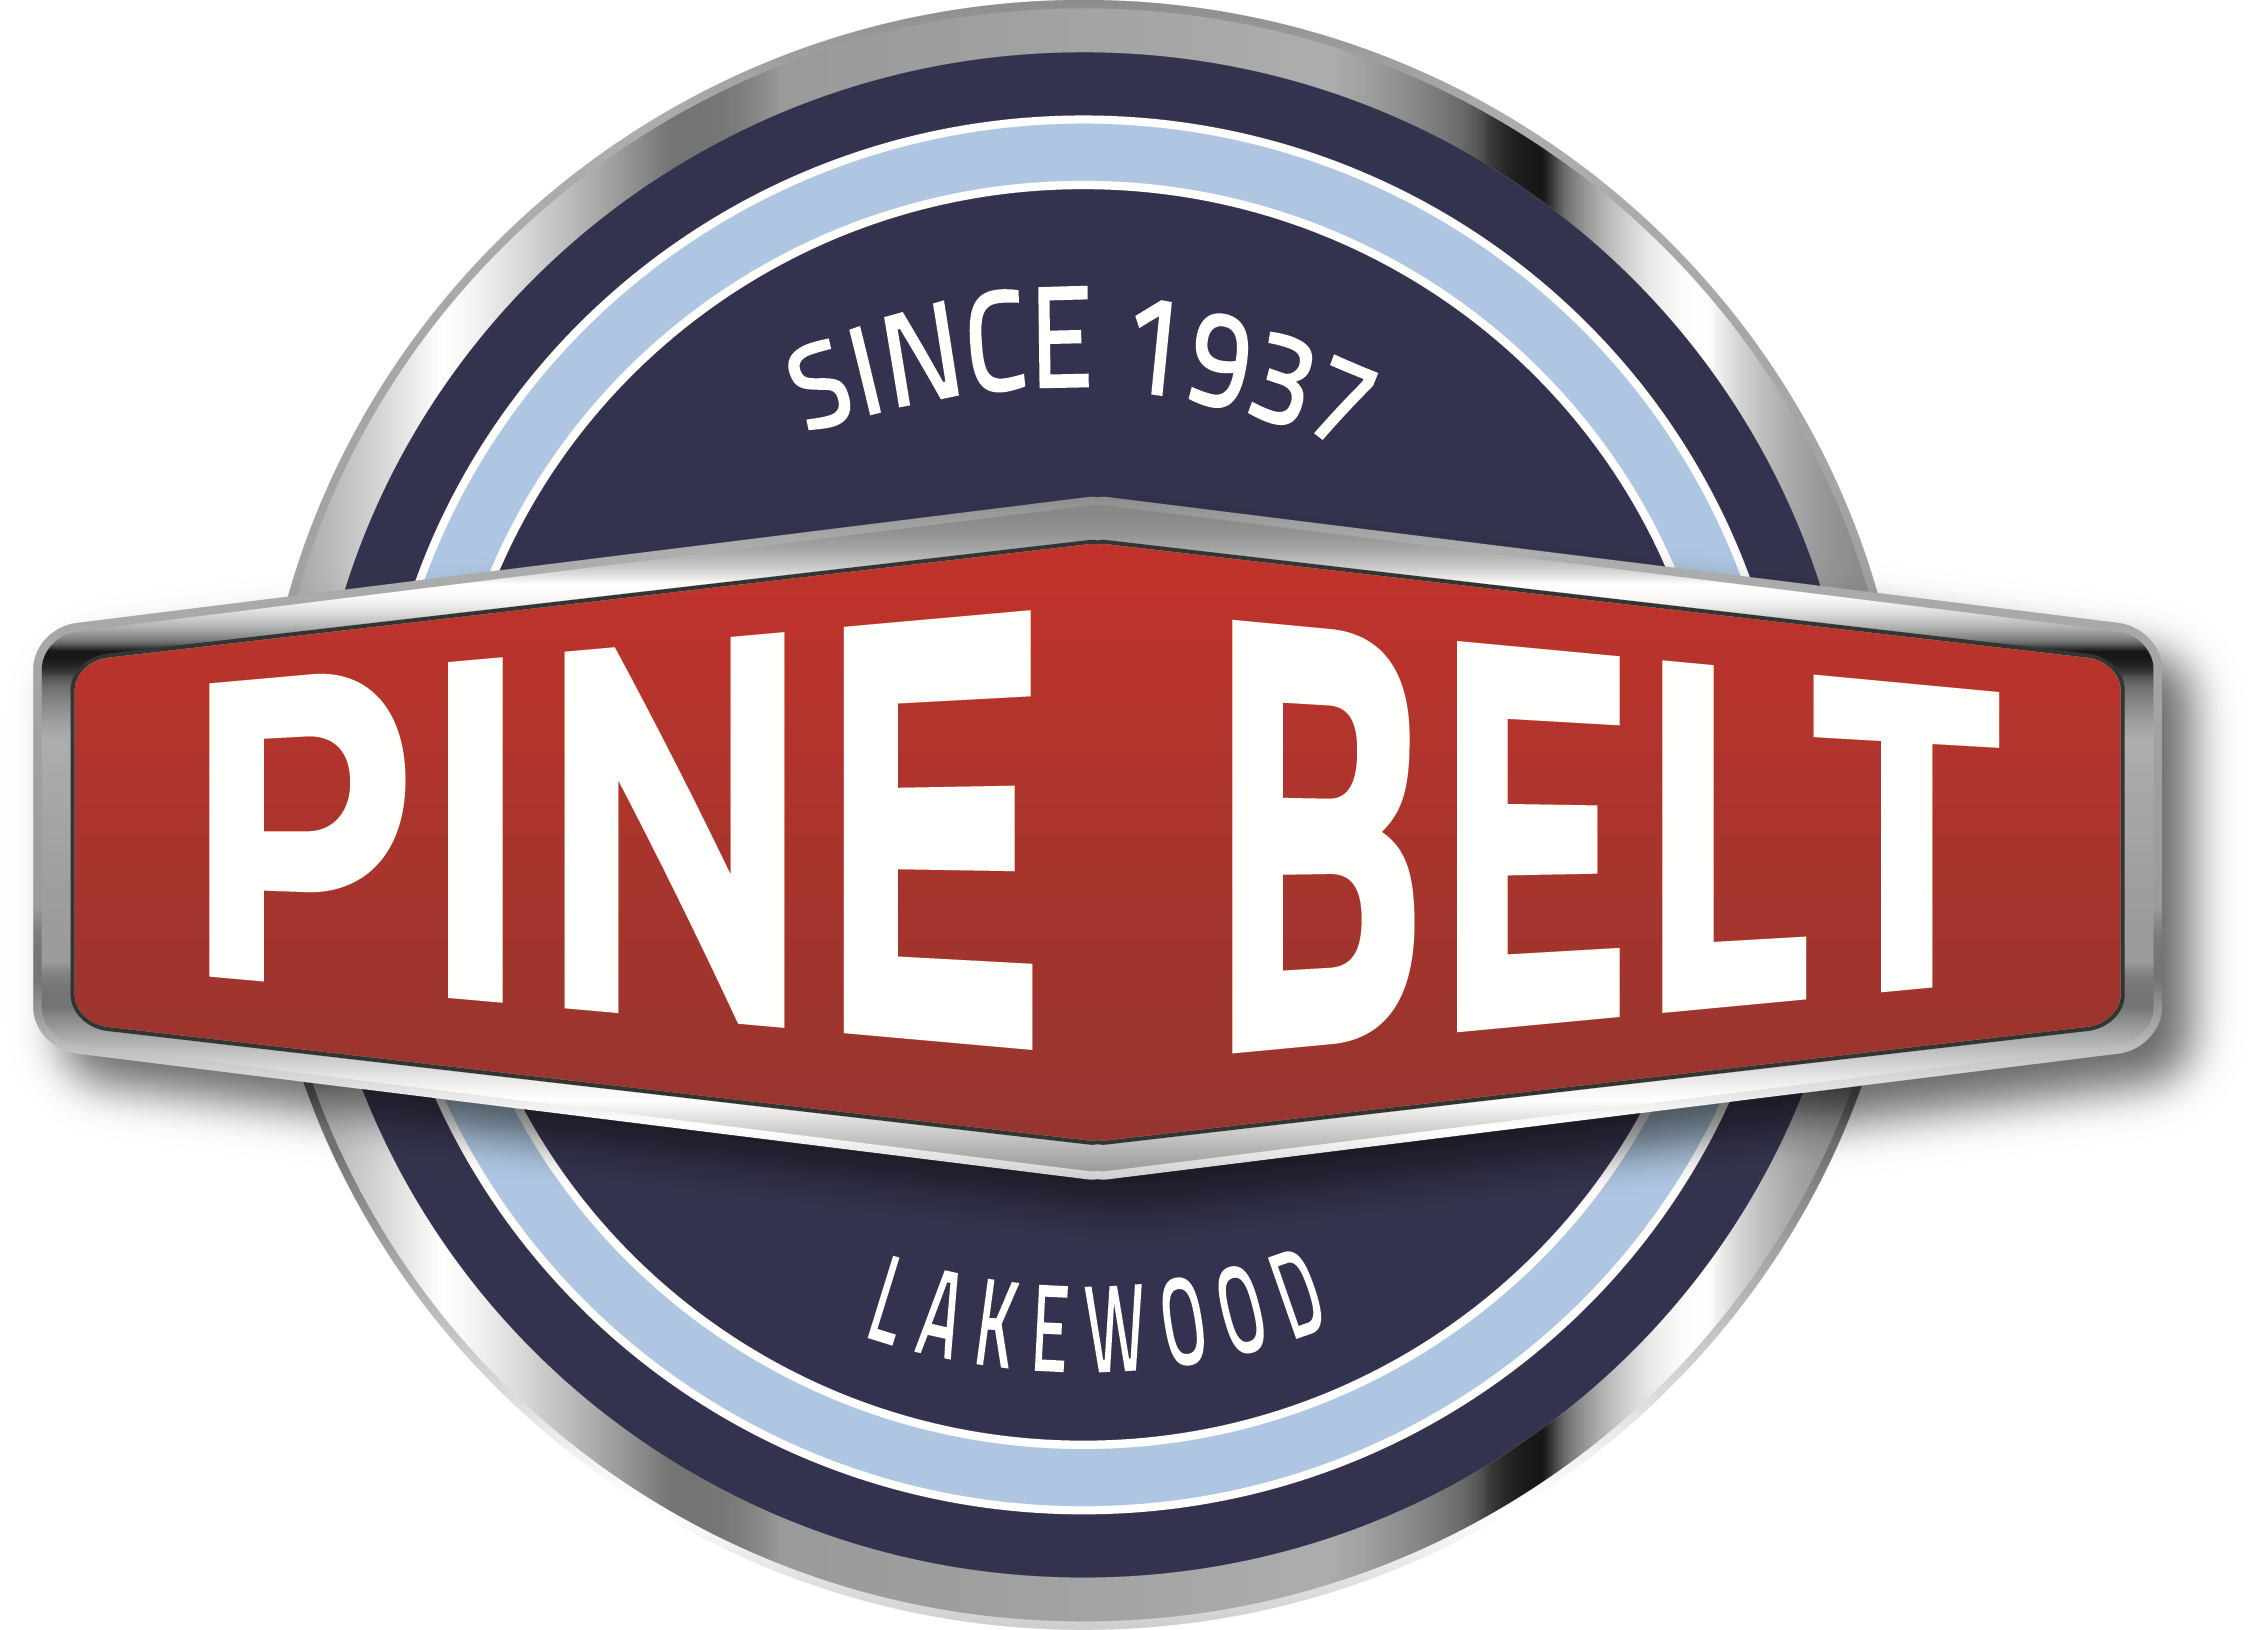 Pine Belt Enterprises, Inc. logo